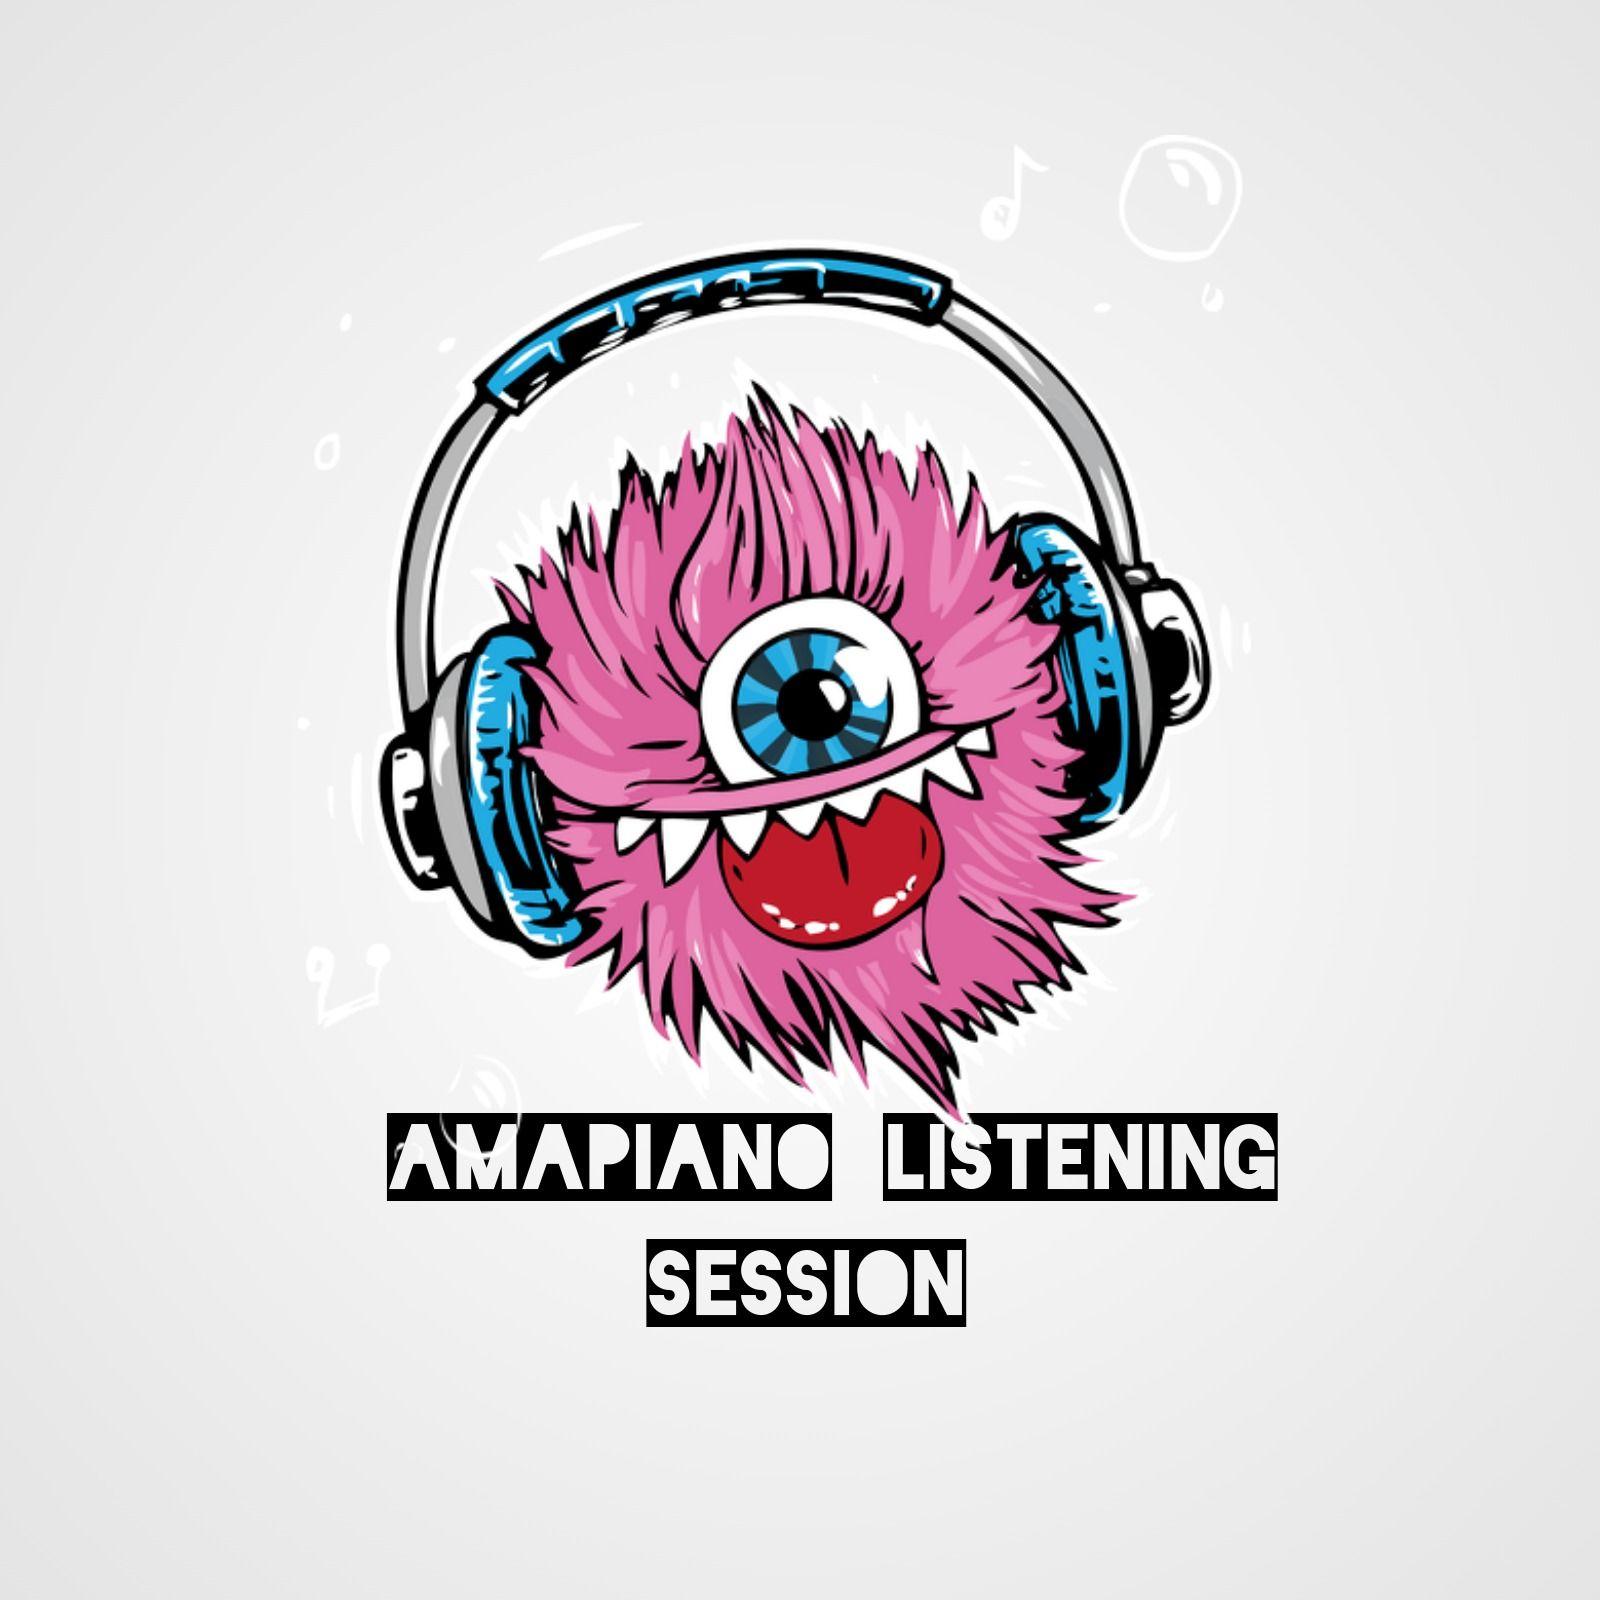 Amapiano ListeninG SessioN